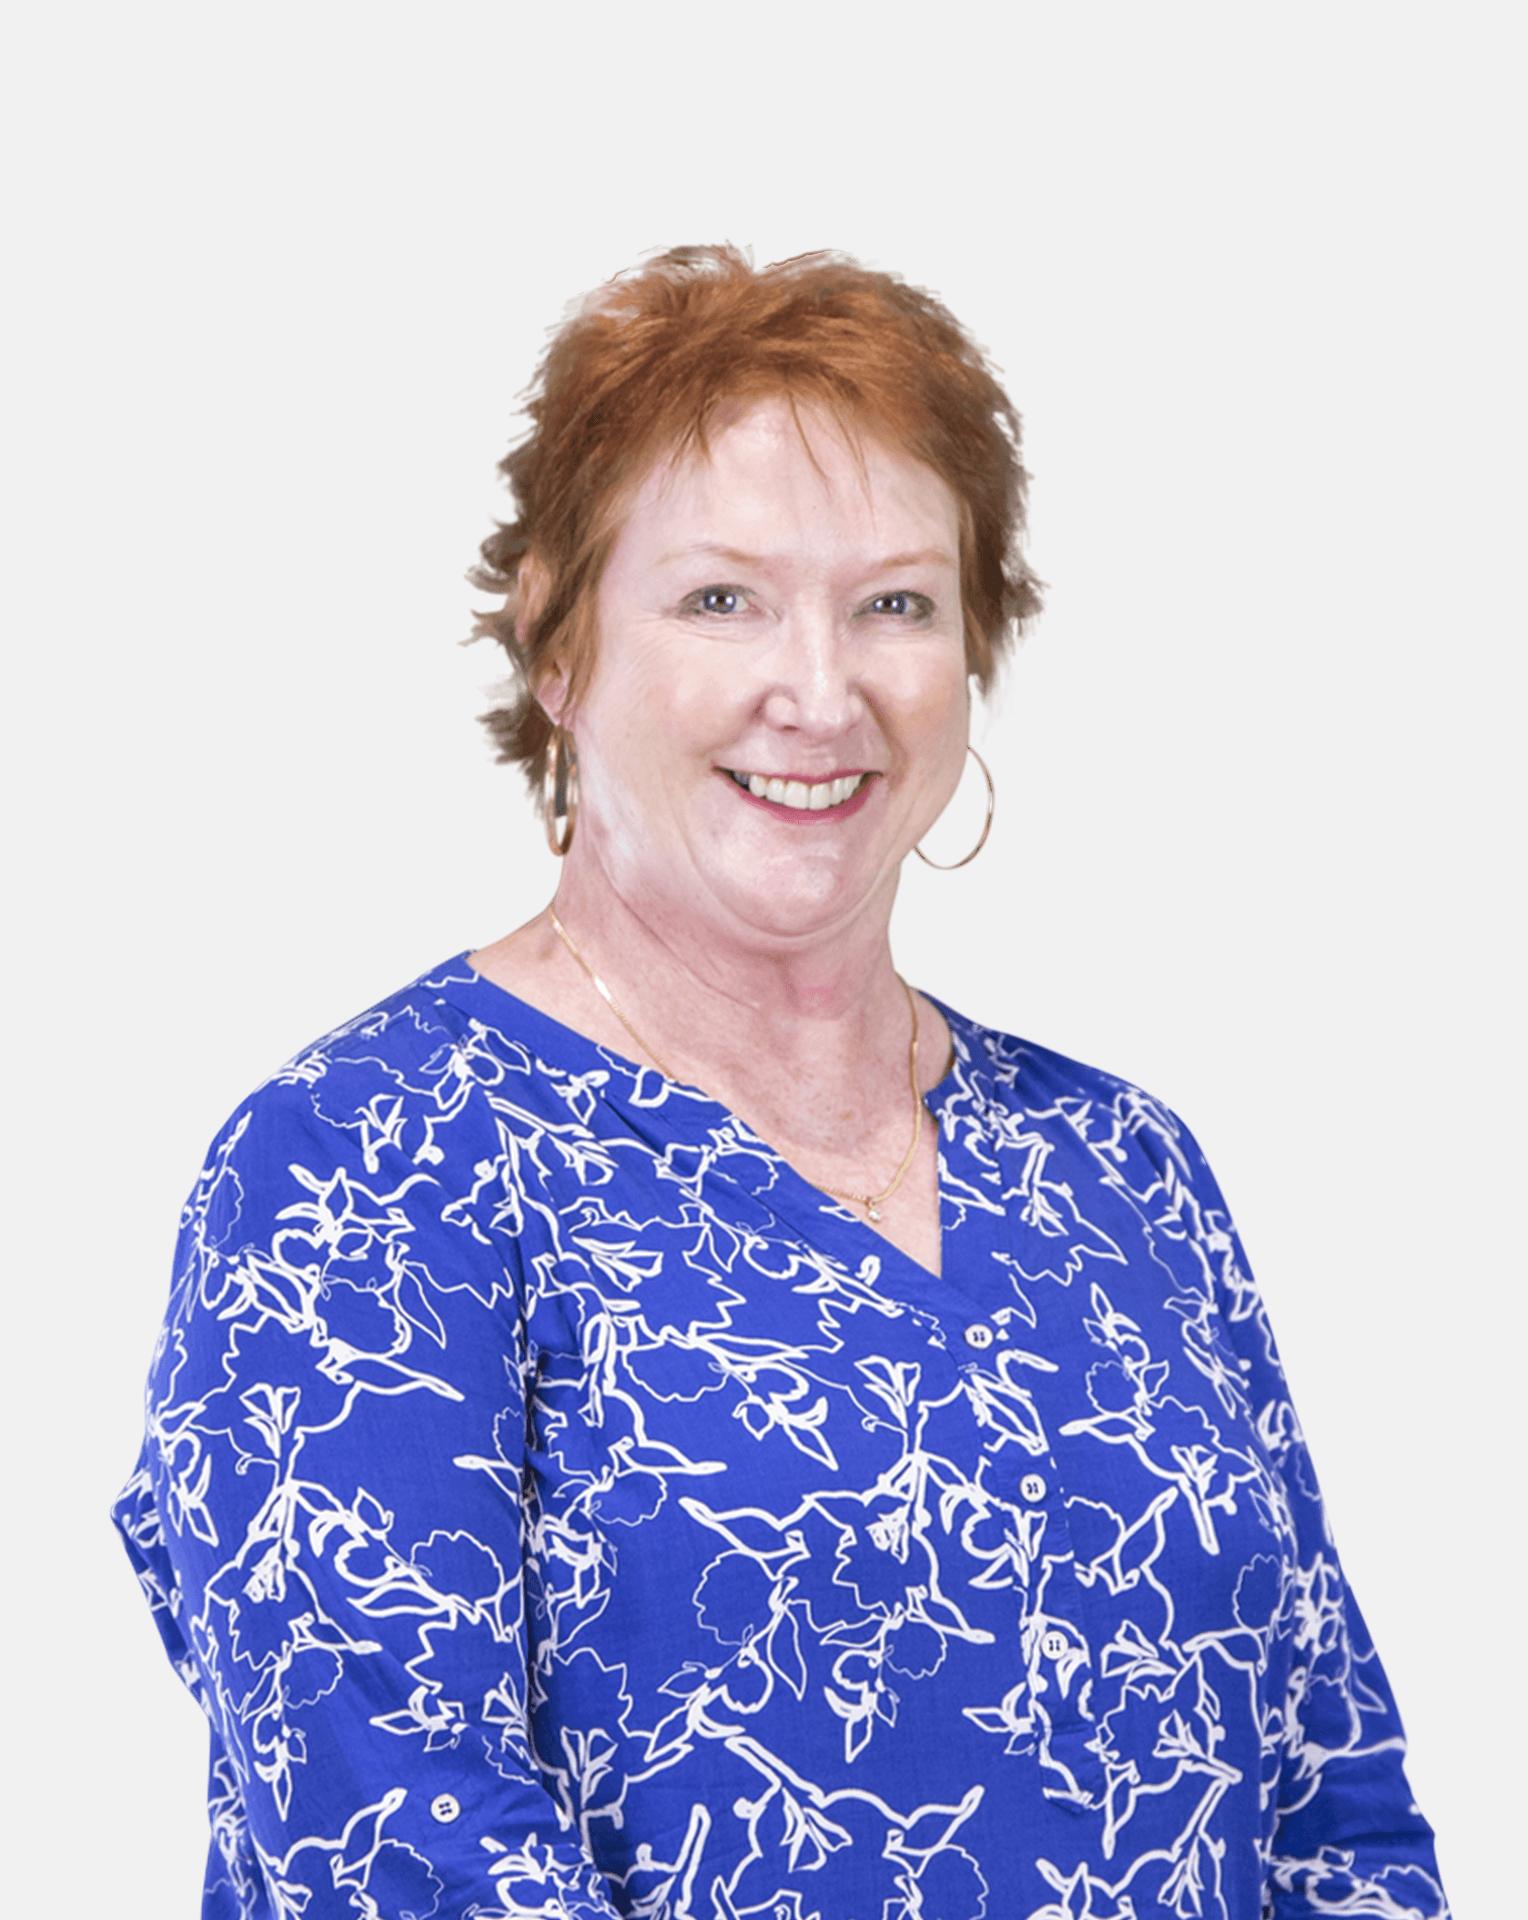 Elaine Glover